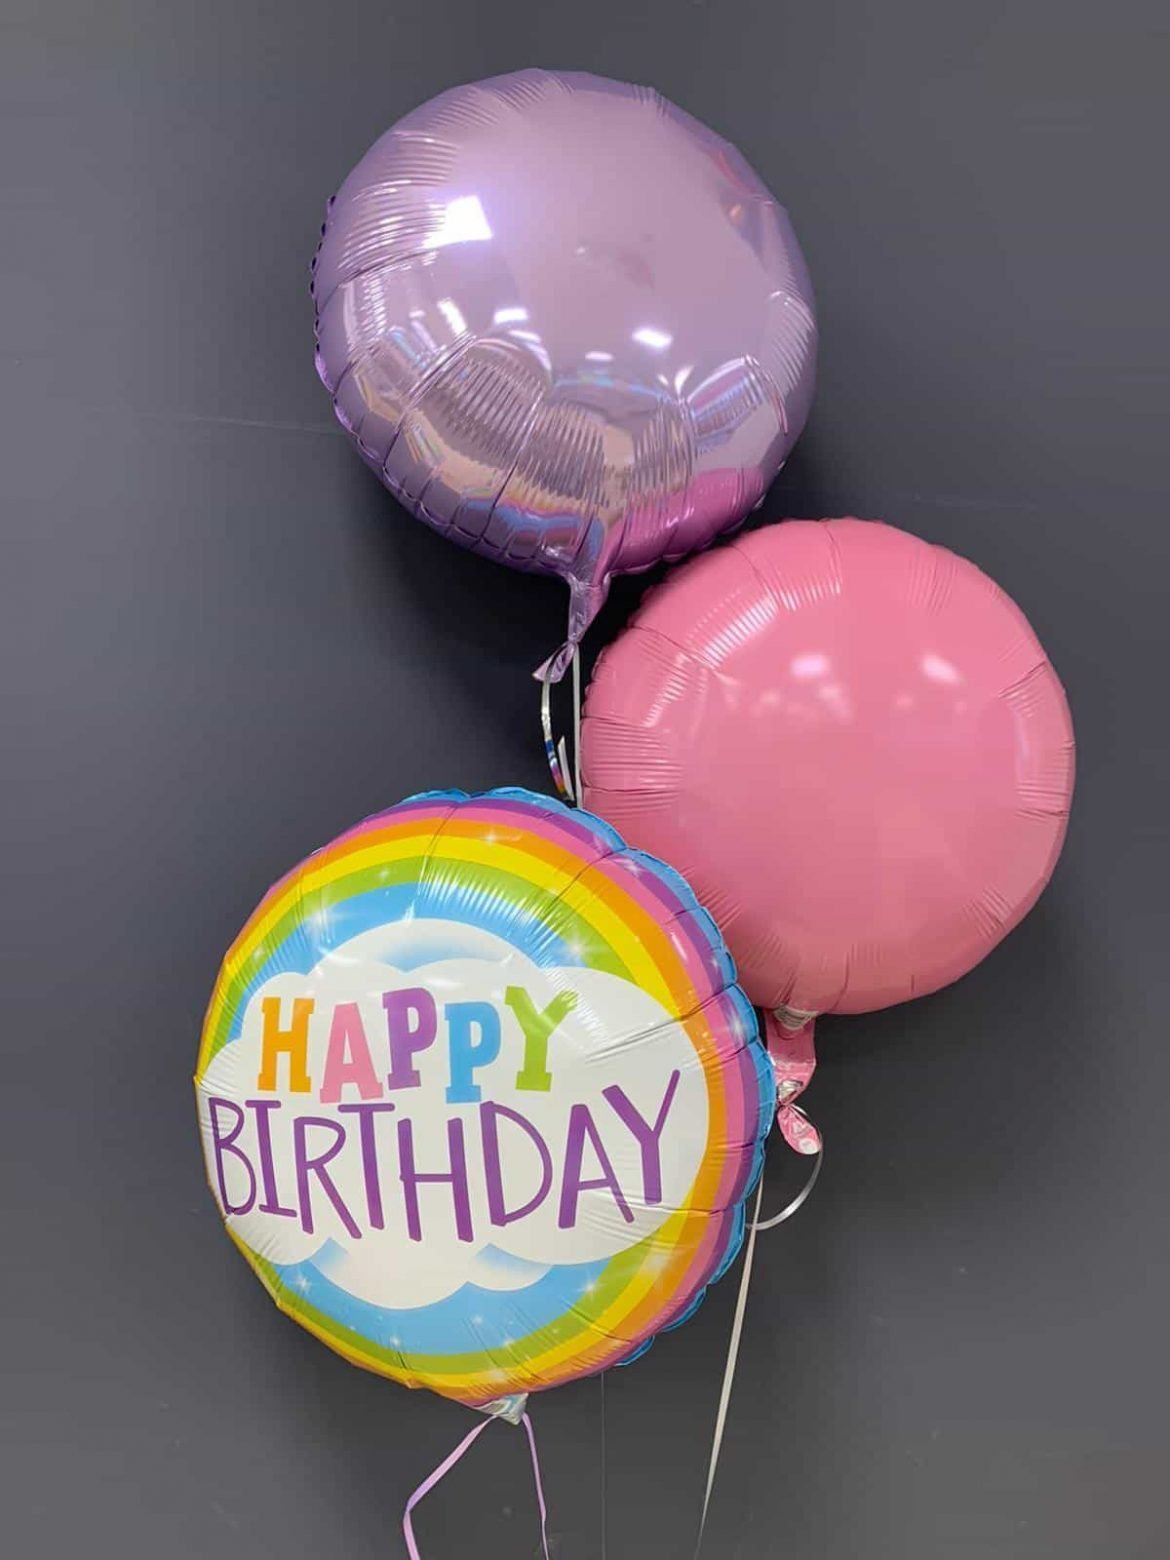 Happy Birthday € 5,50<br />Dekoballons € 4,50 1